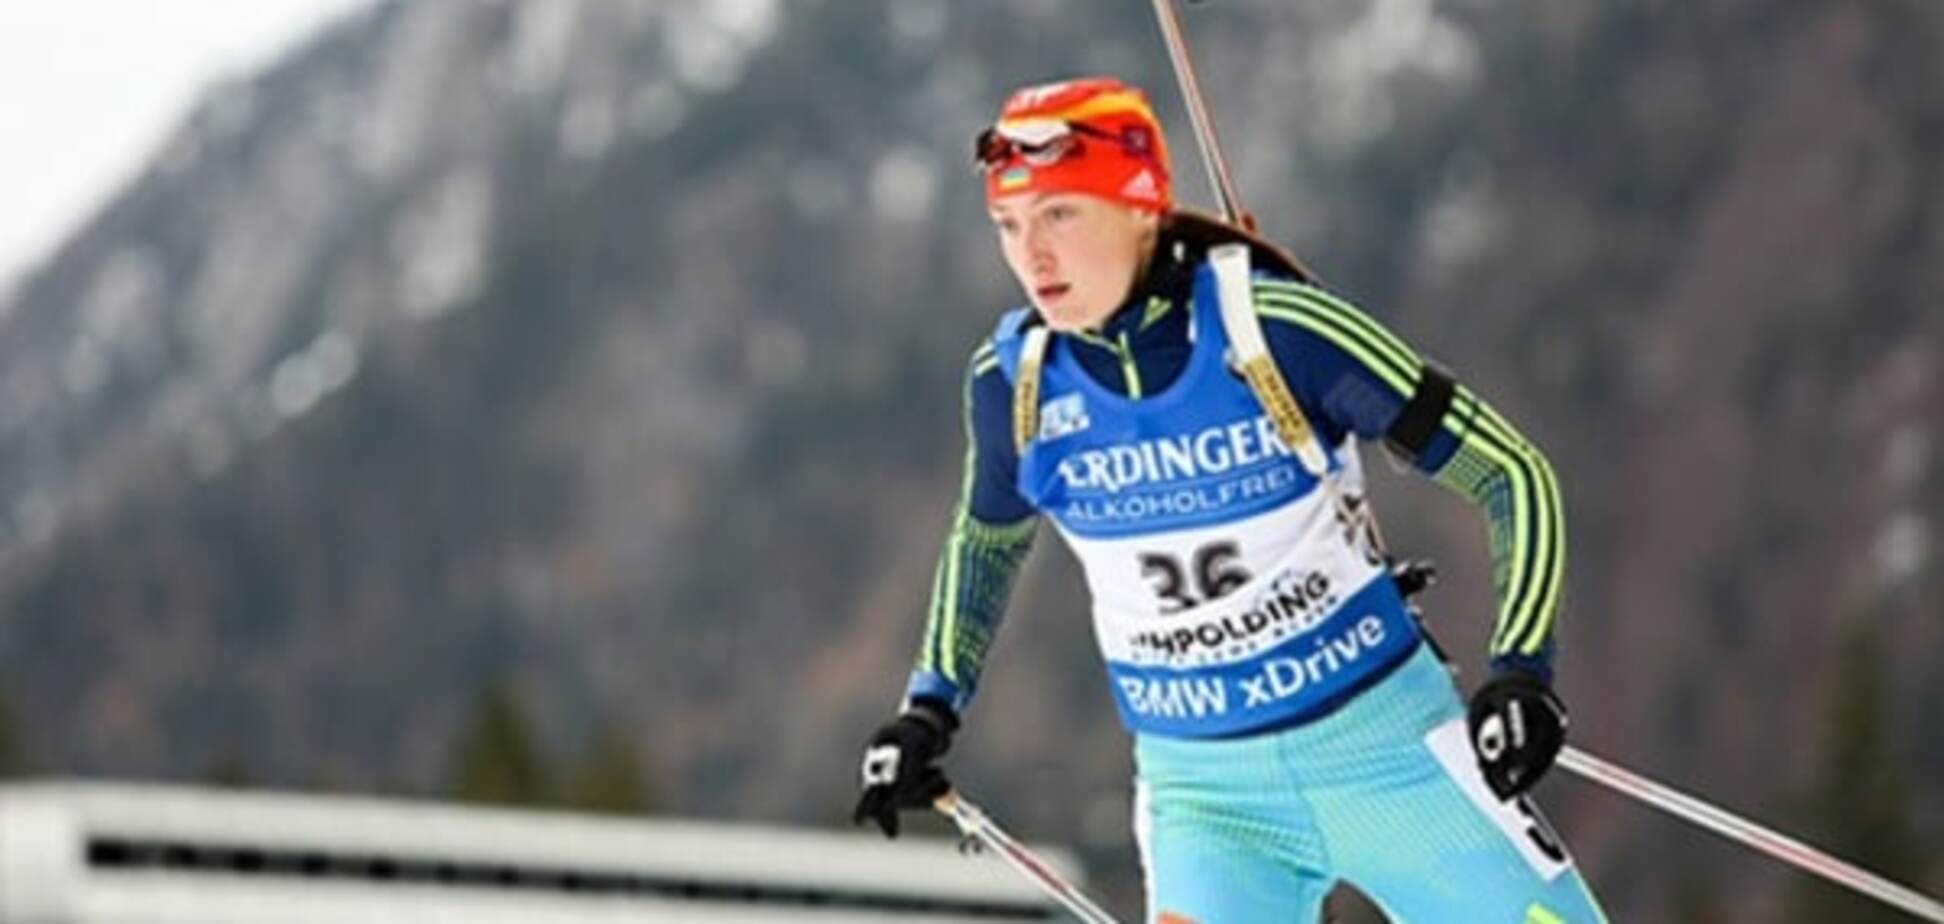 Украинскую биатлонистку отстранили от чемпионата мира